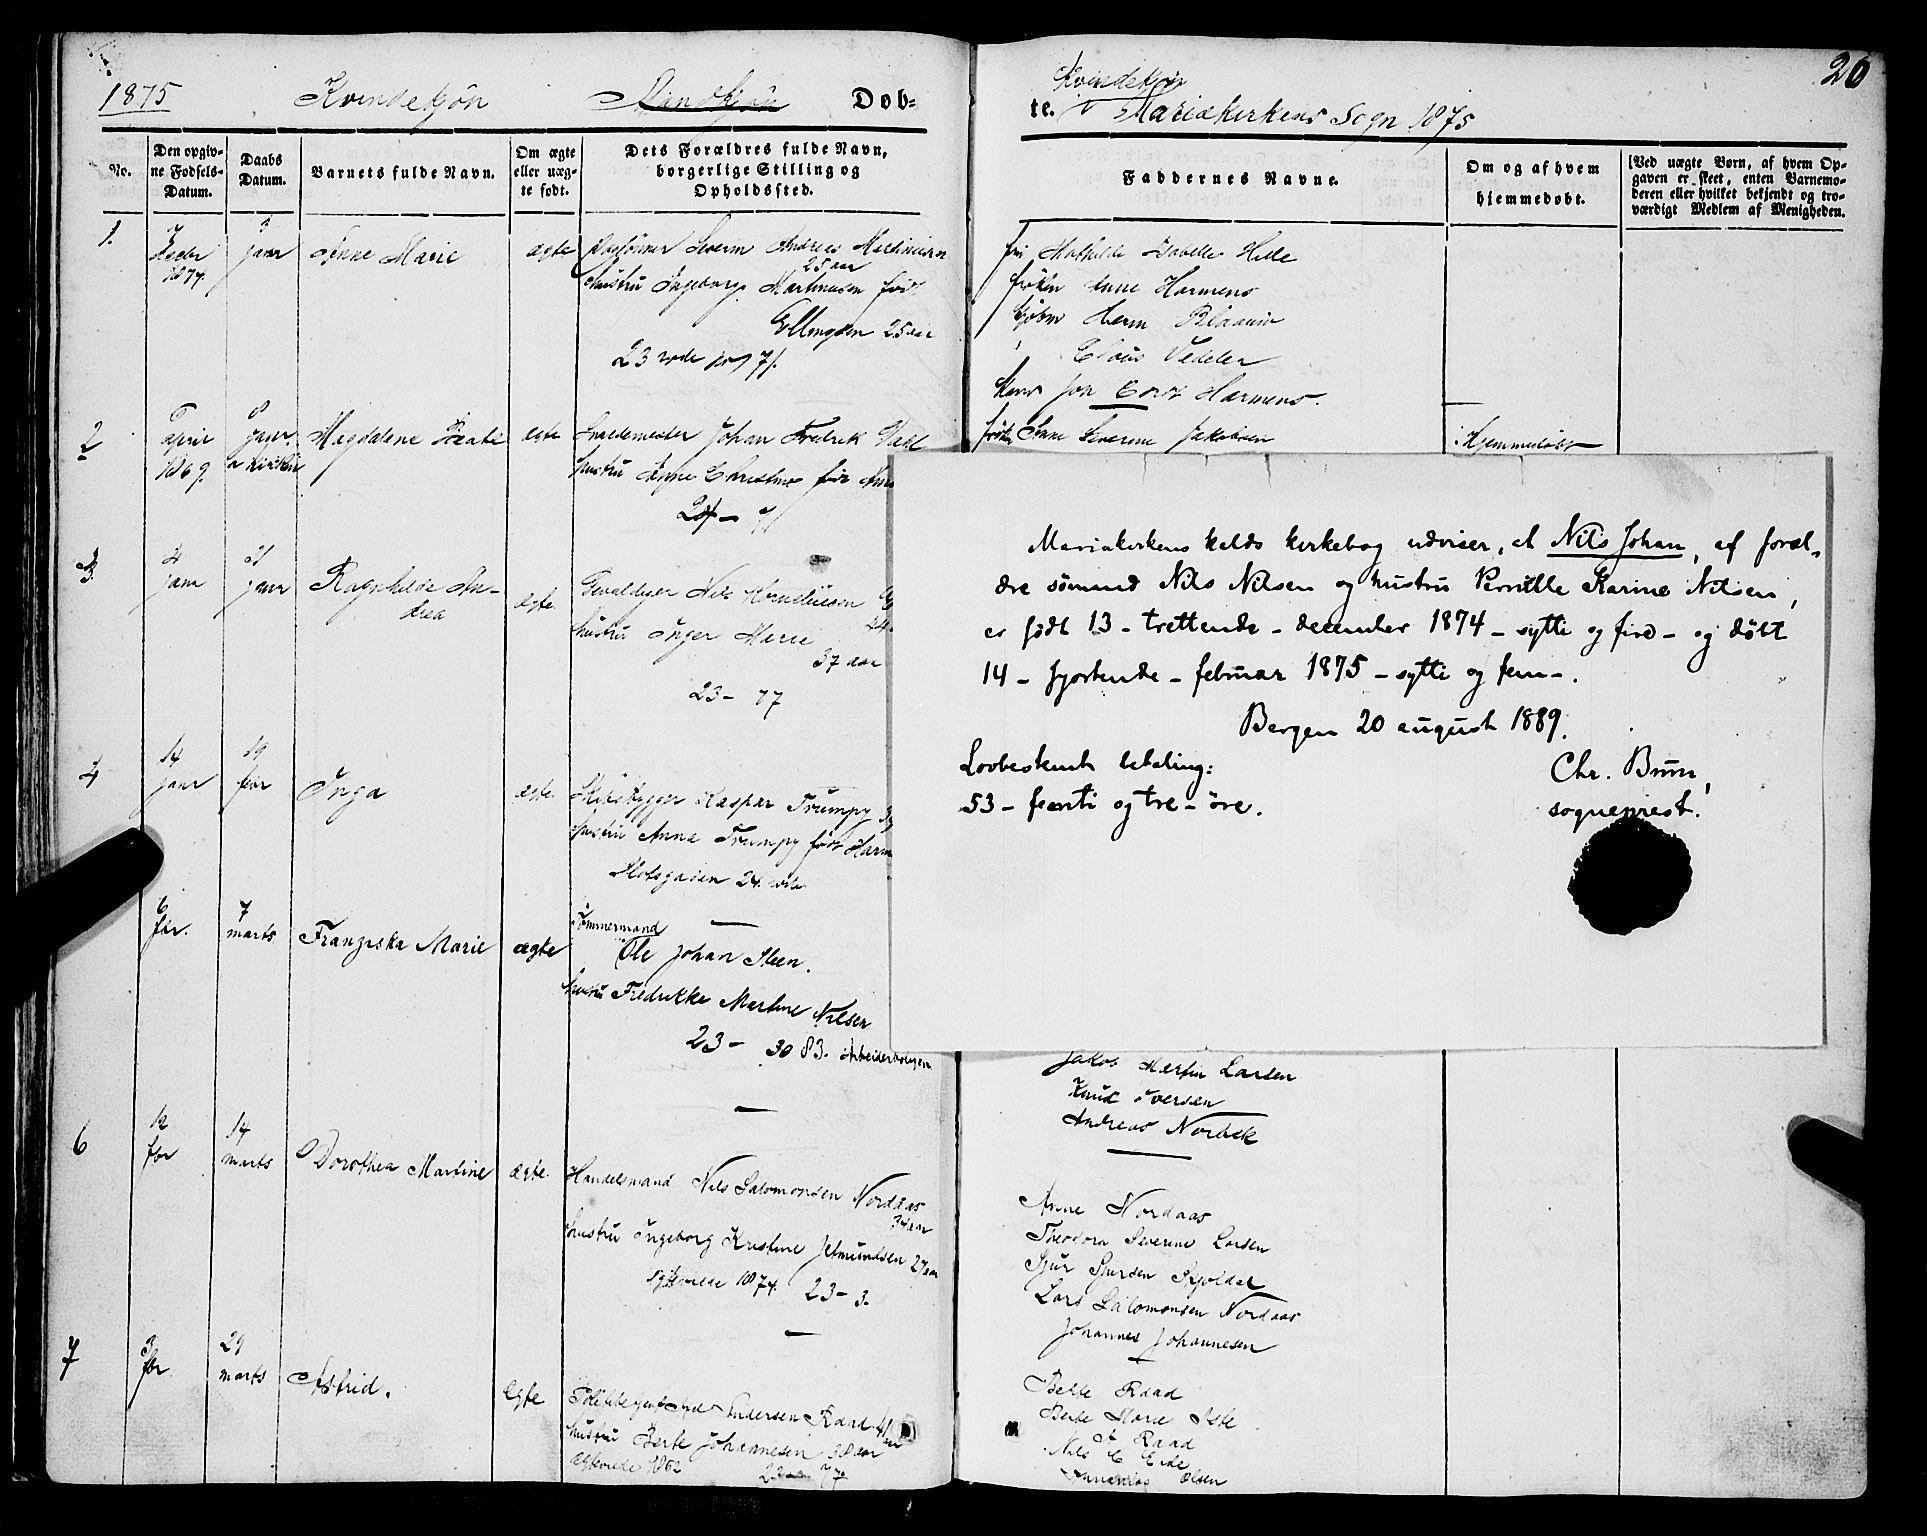 SAB, Mariakirken Sokneprestembete, H/Haa/L0006: Ministerialbok nr. A 6, 1846-1877, s. 20